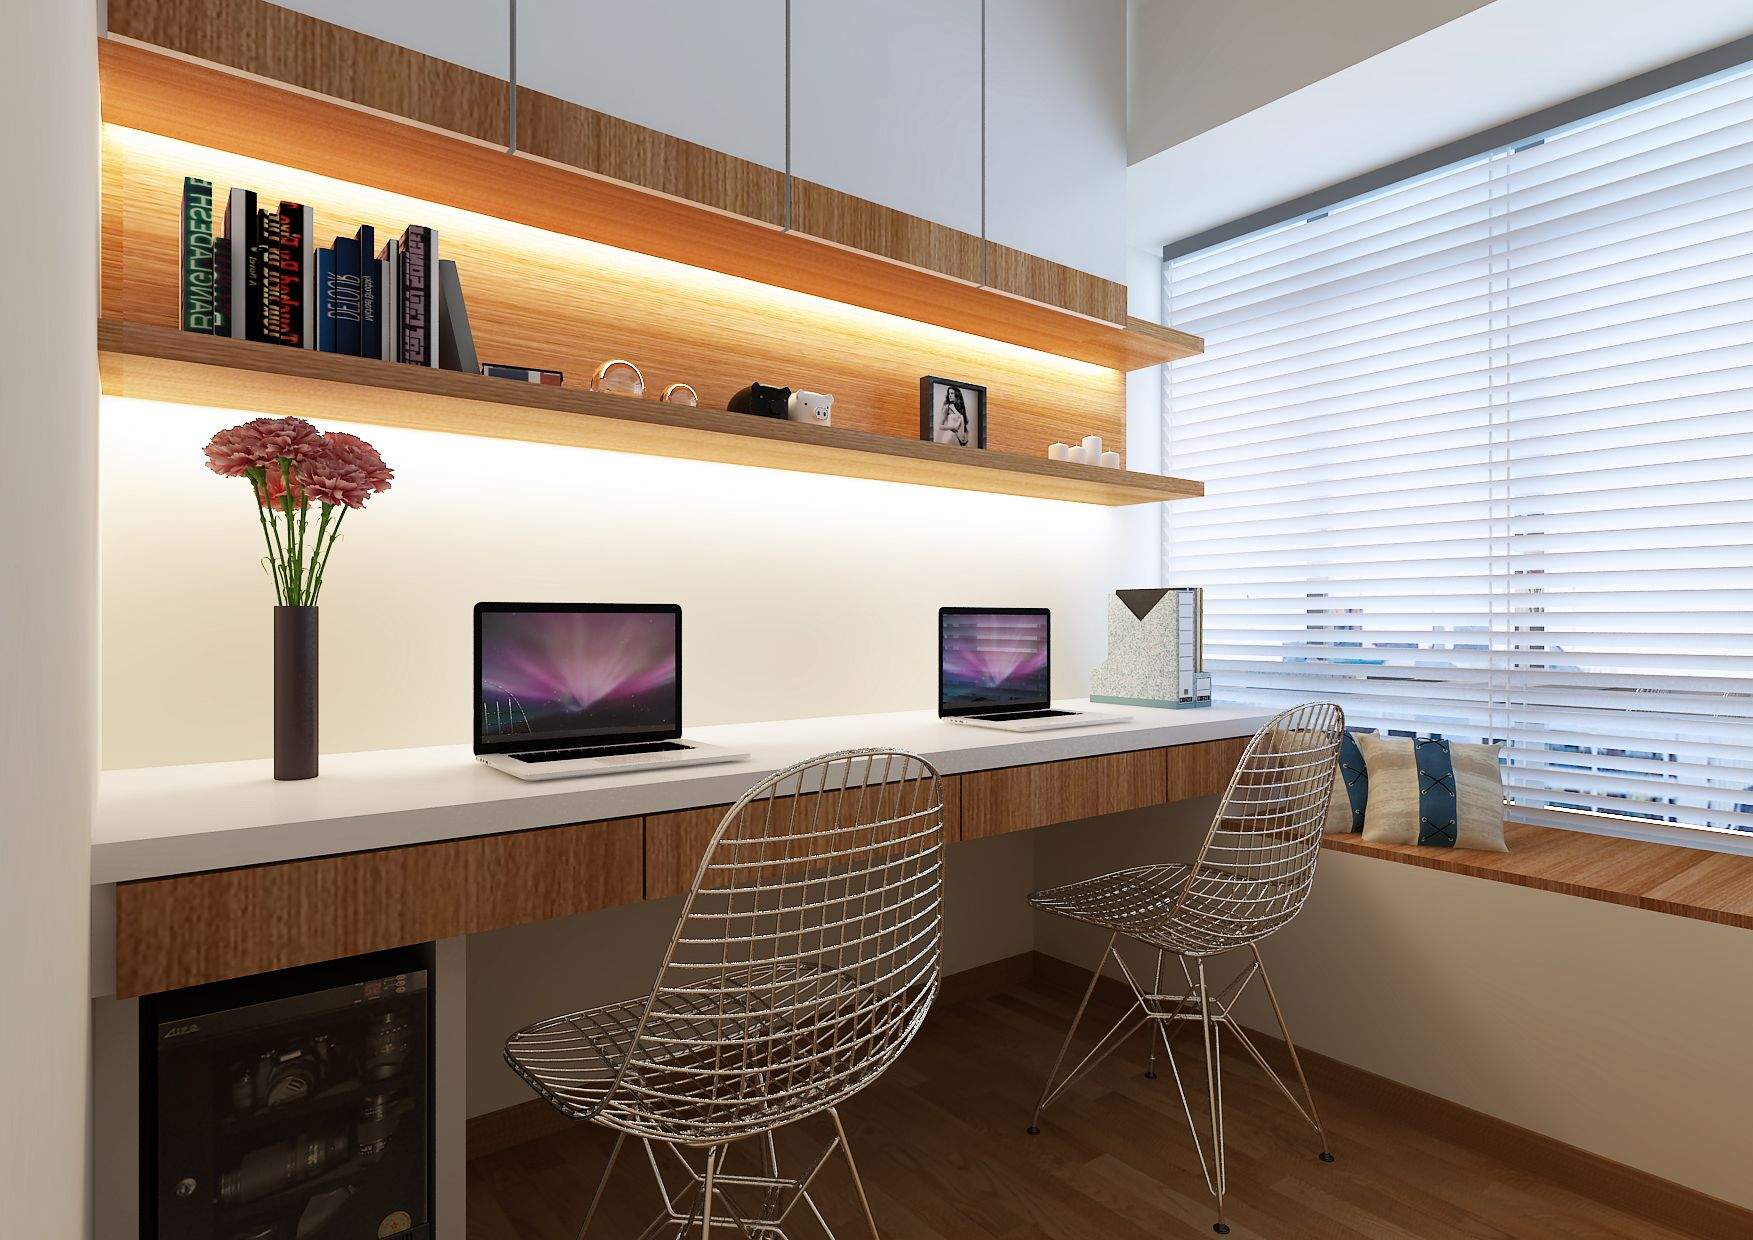 Small Study Room Ideas - Google Search